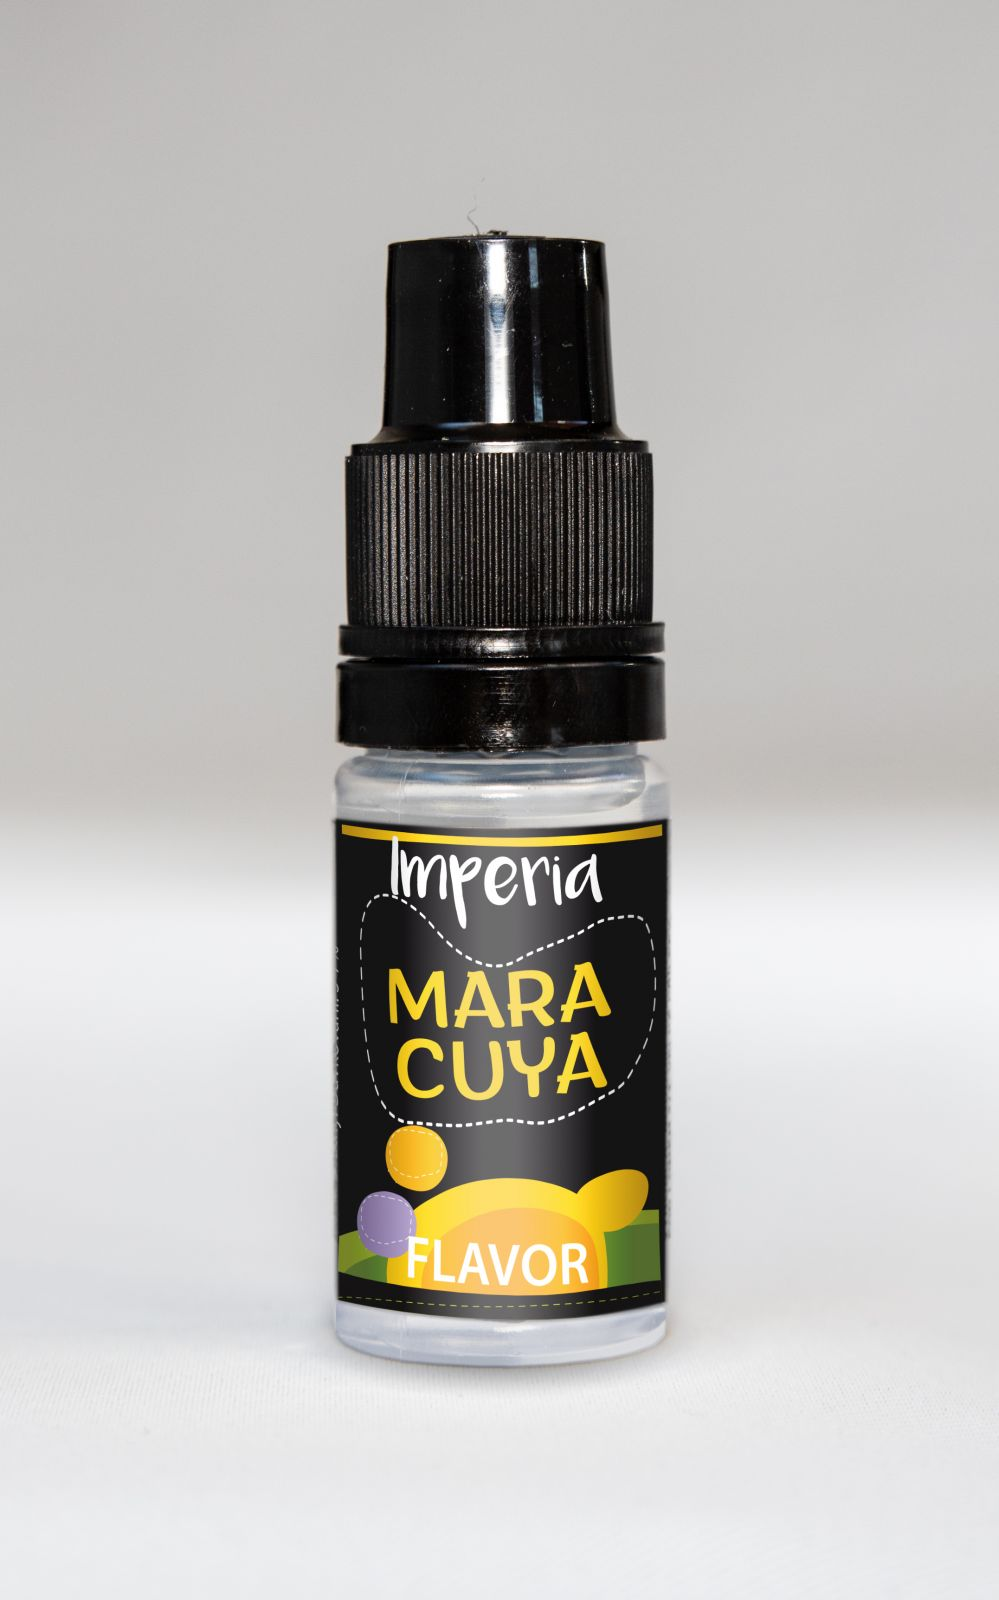 MARACUYA - Aróma Imperia Black Label Boudoir Samadhi s.r.o.